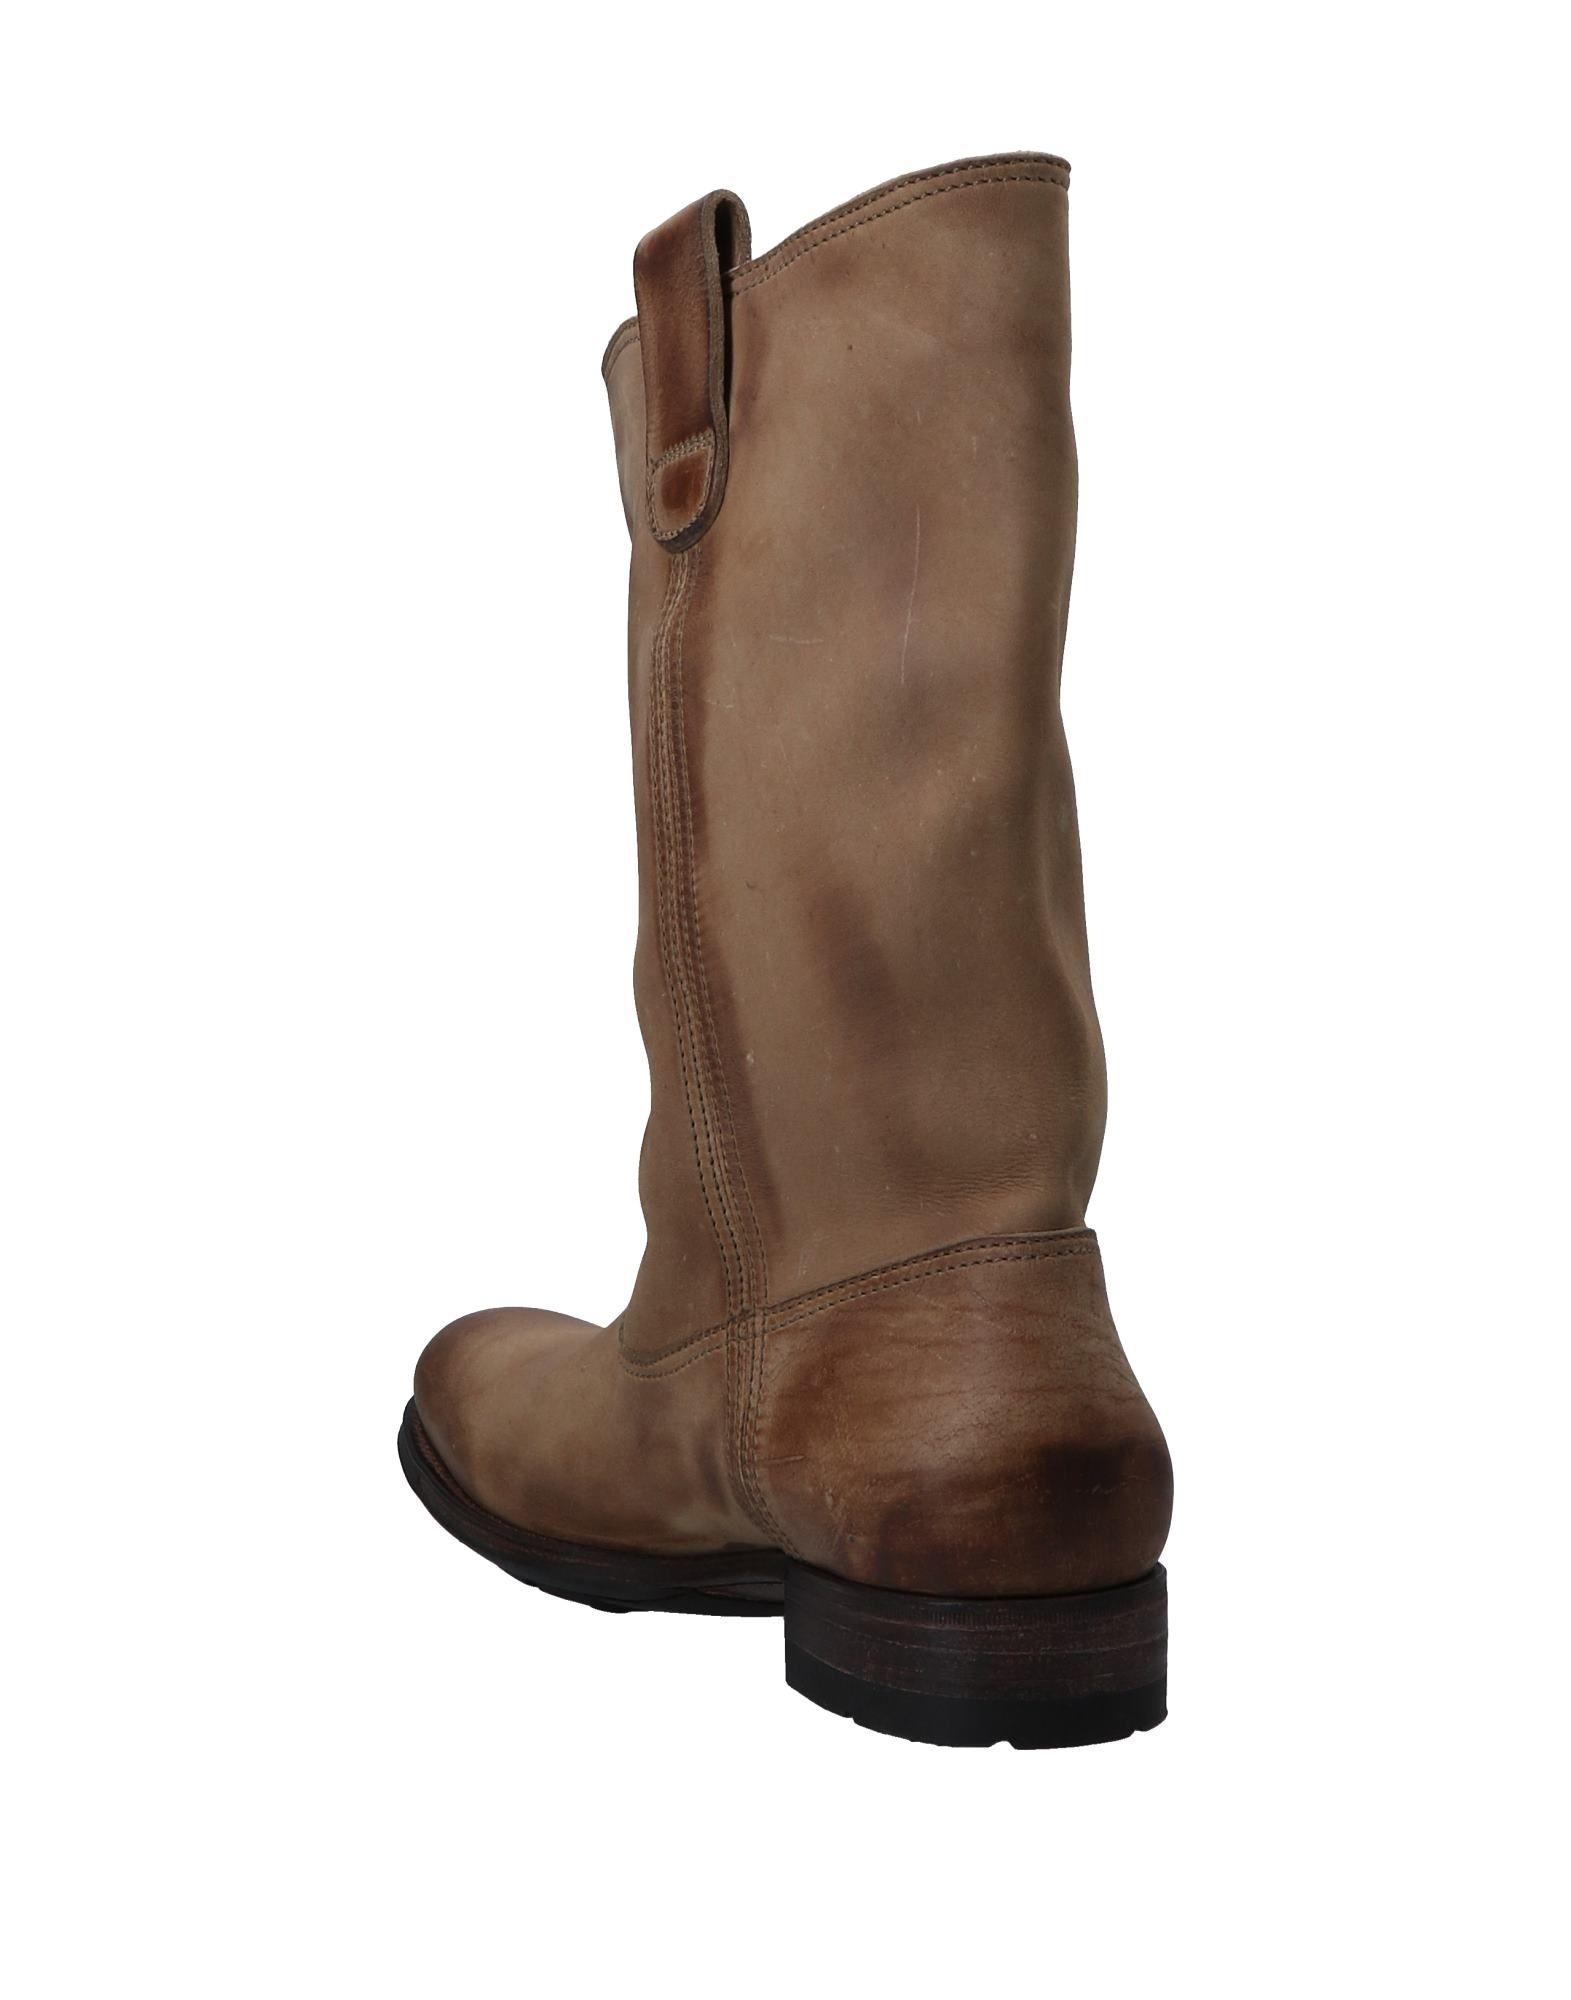 N.D.C. Made By Hand Boots - - - Men N.D.C. Made By Hand Boots online on  Australia - 44781388MN 6061b2